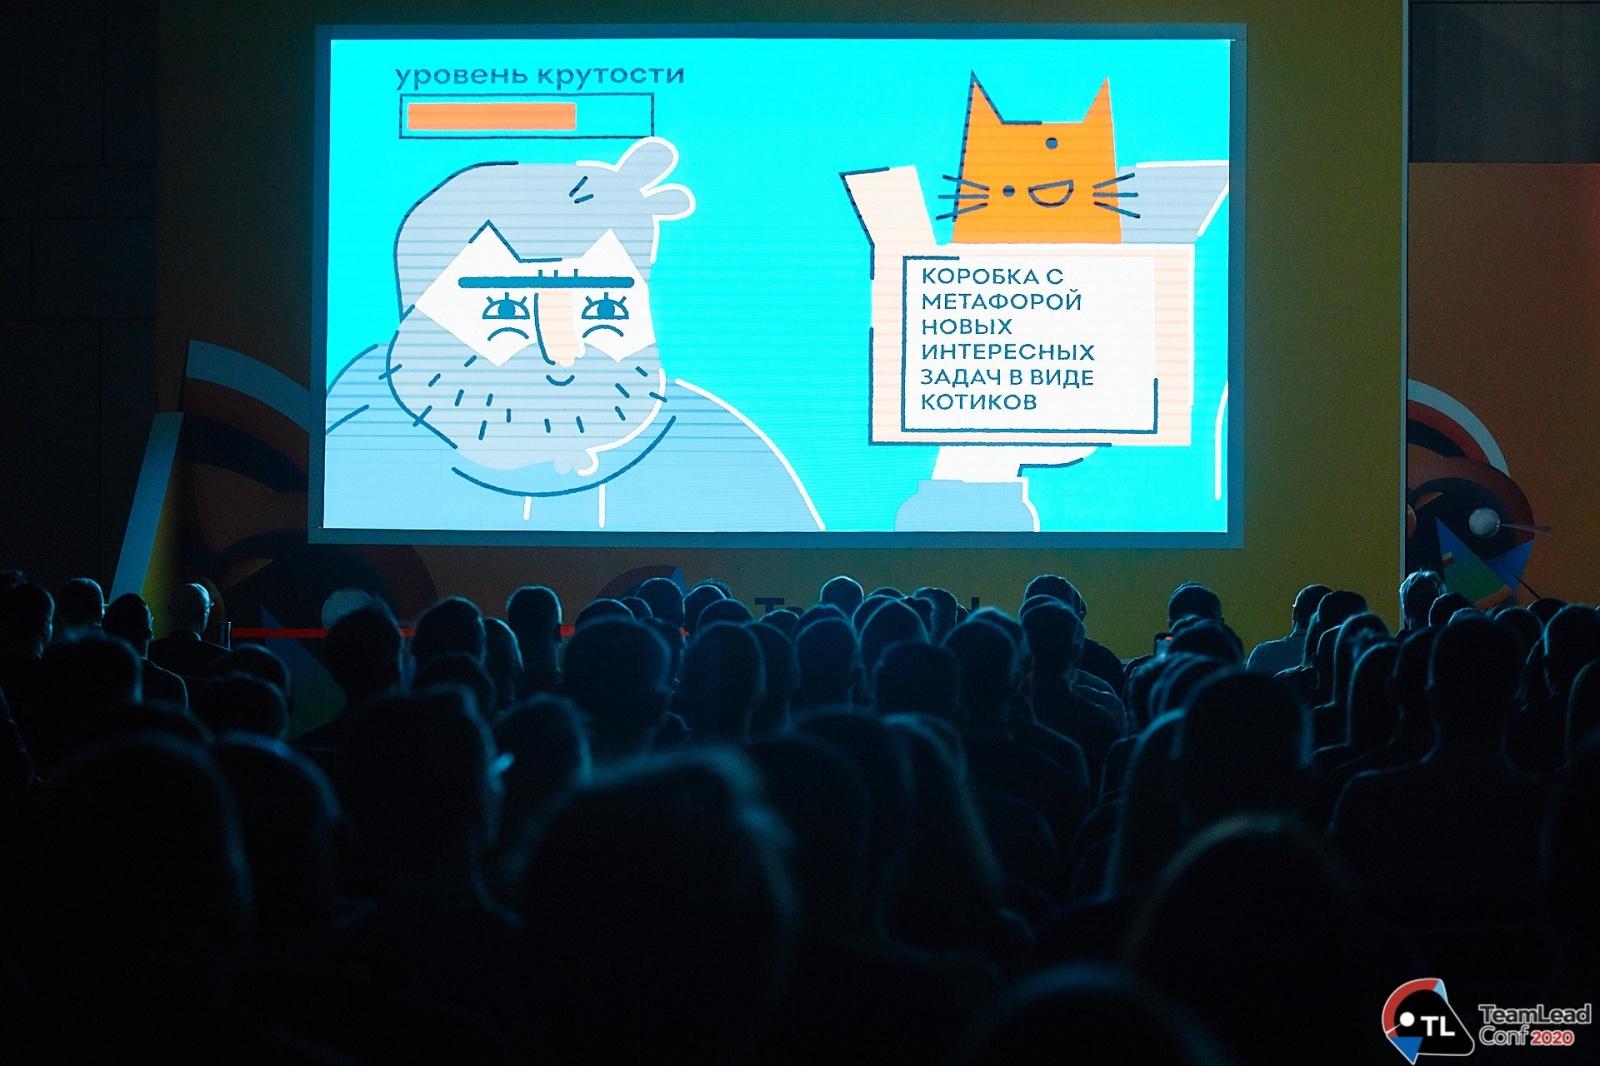 «Больше интерактива!» или Как прошел TeamLead Conf 2020 - 18